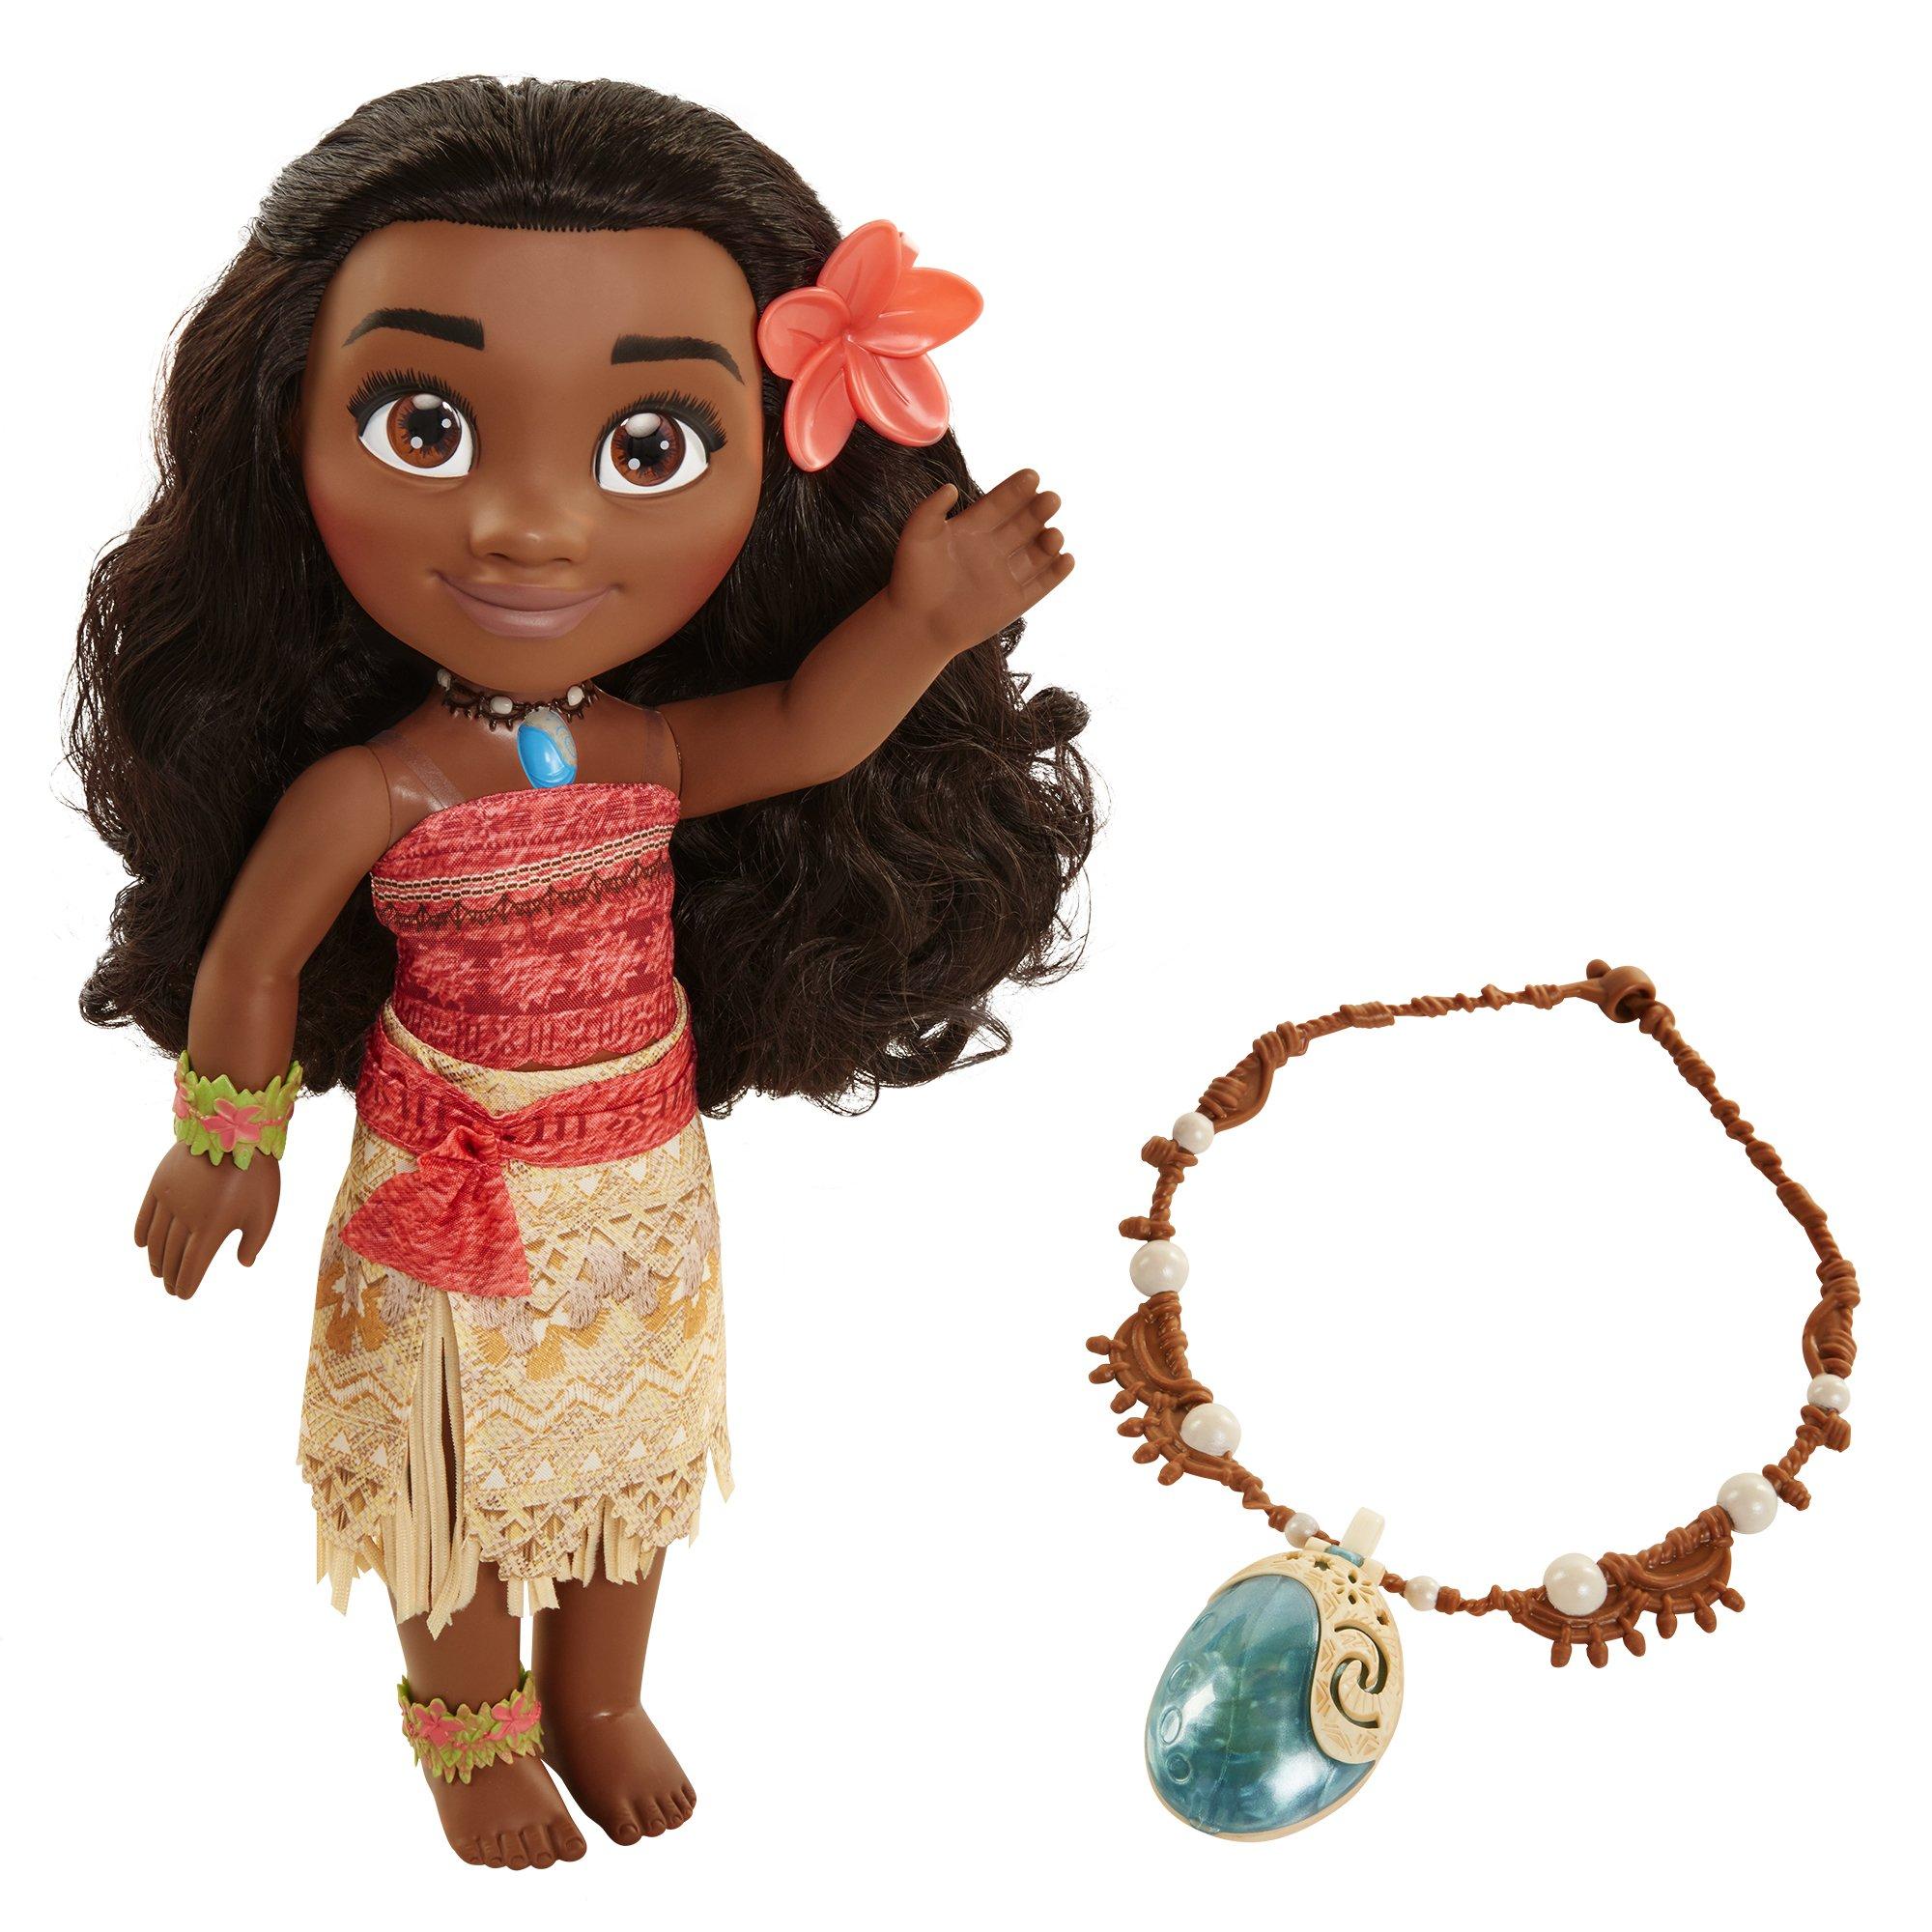 Disney Moana Adventure With Magical Seashell Necklace Doll